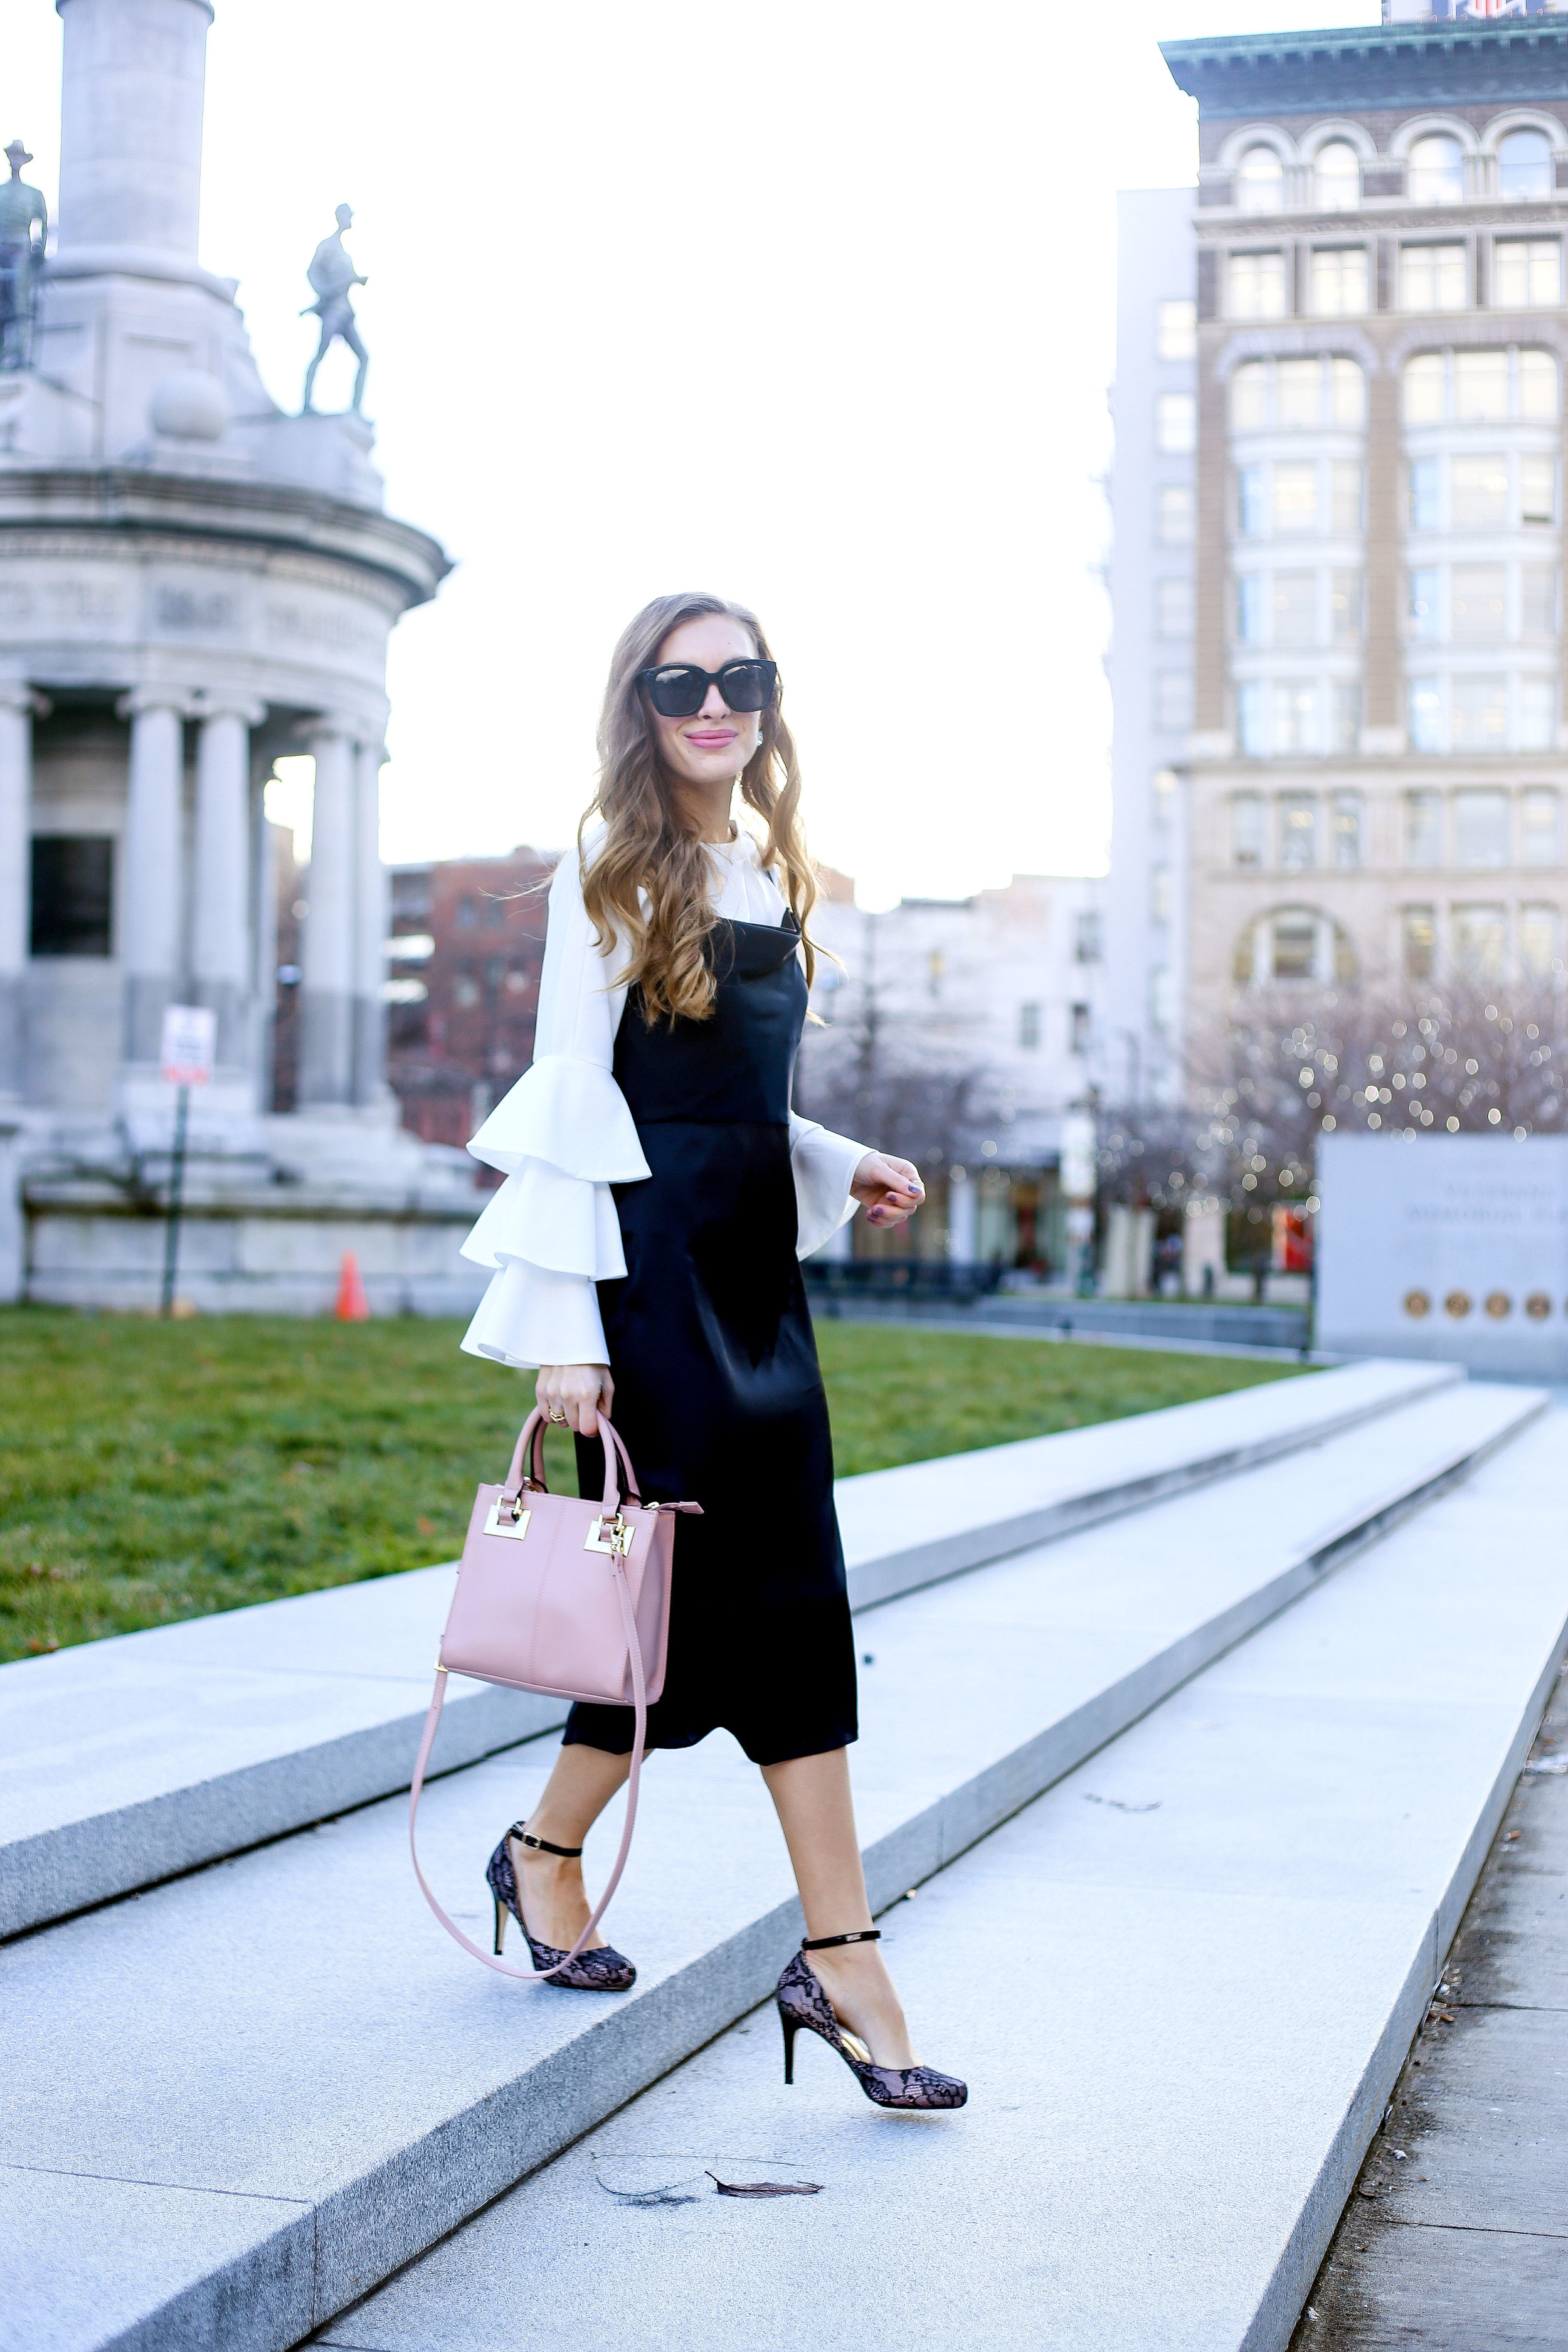 The Slip Dress- Enchanting Elegance